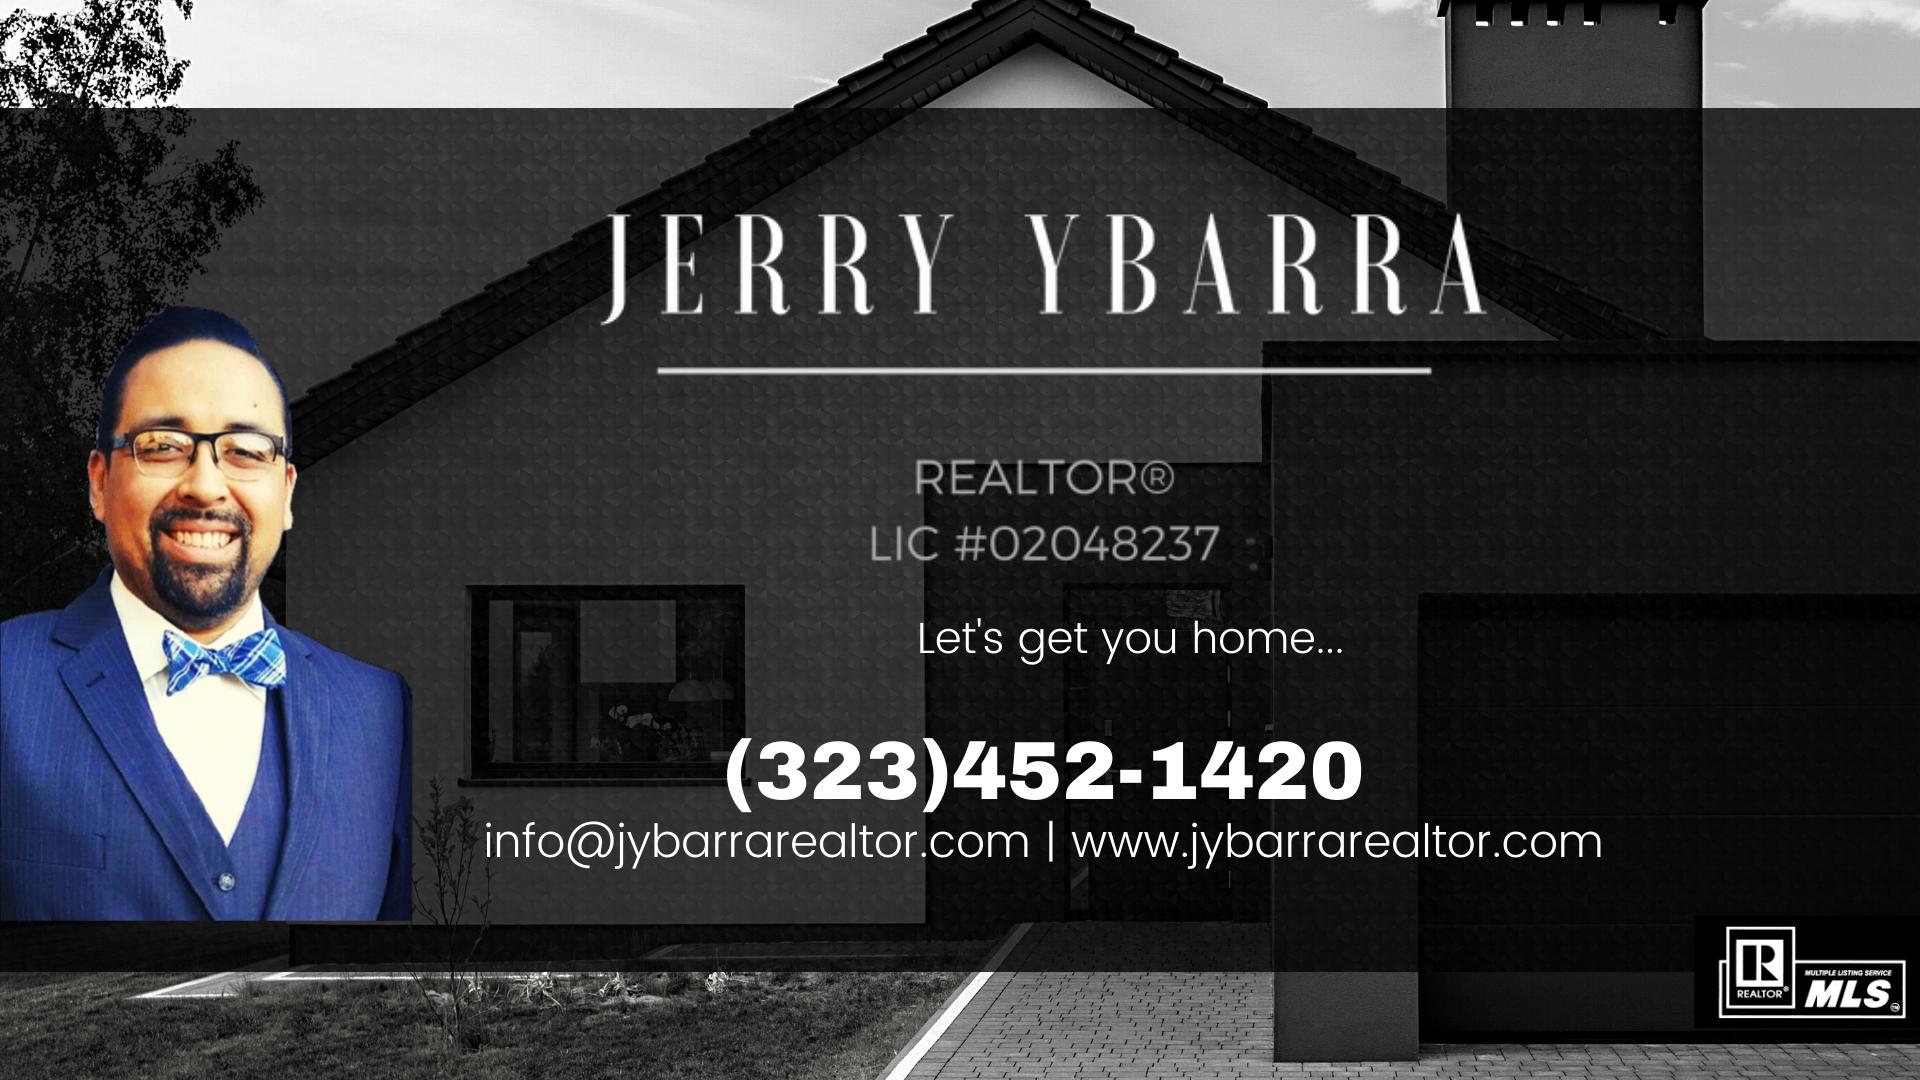 Homepage - Jerry Ybarra | REALTOR®